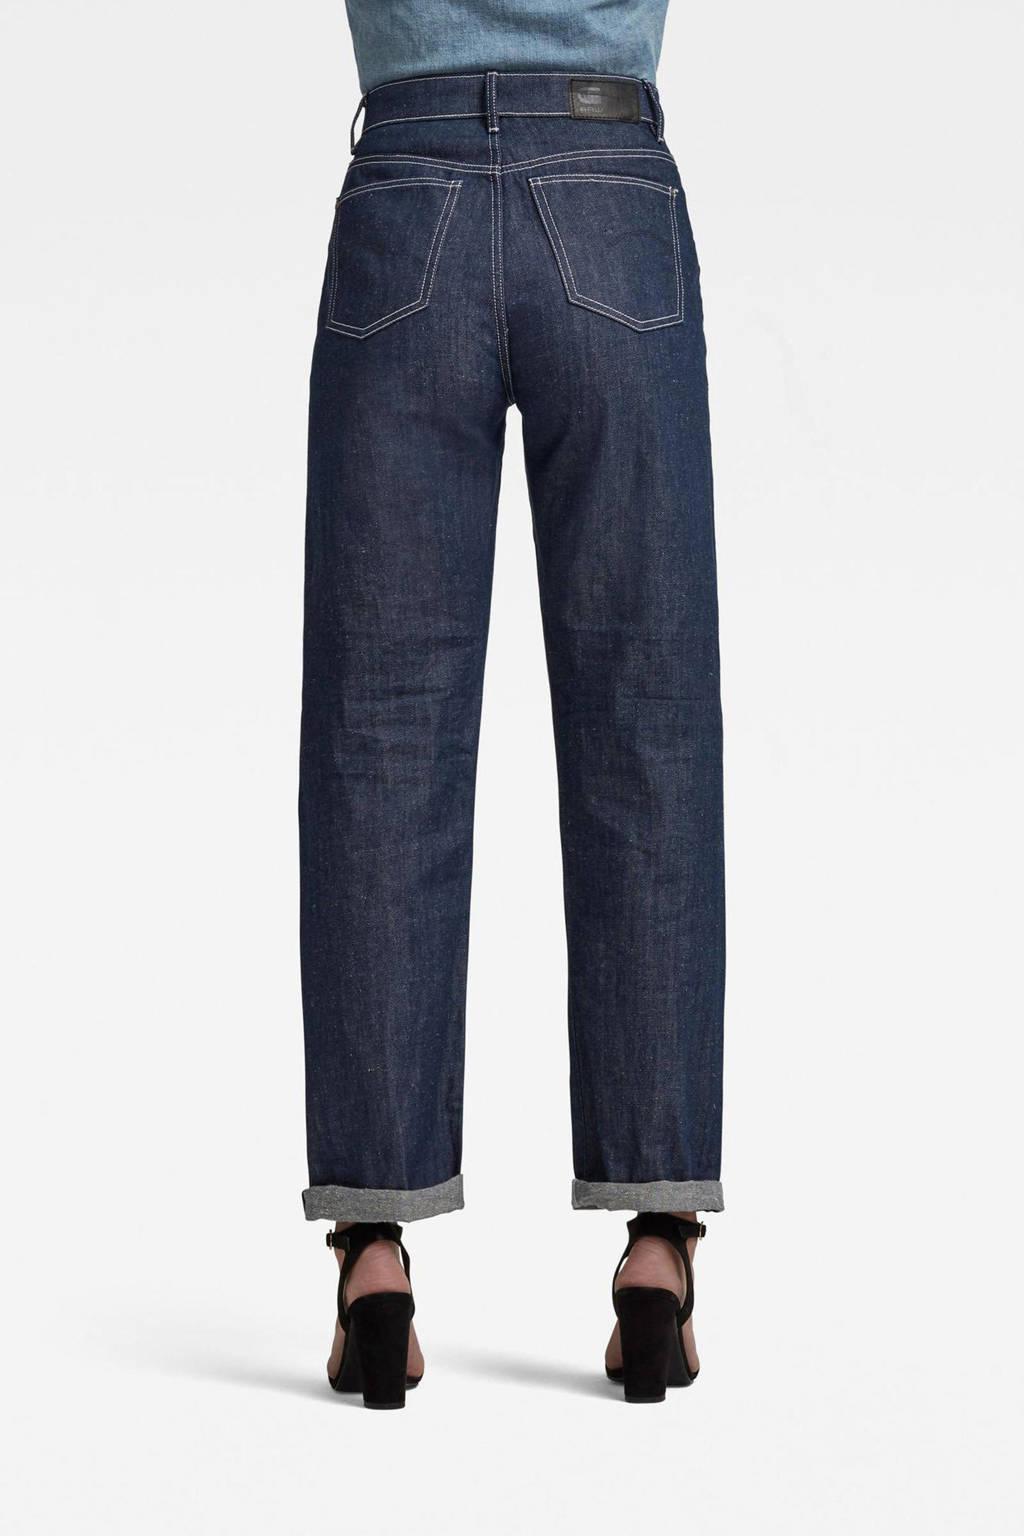 G-Star RAW Tedie ultra high long straight high waist straight fit jeans melsort denim c665, Melsort denim C665